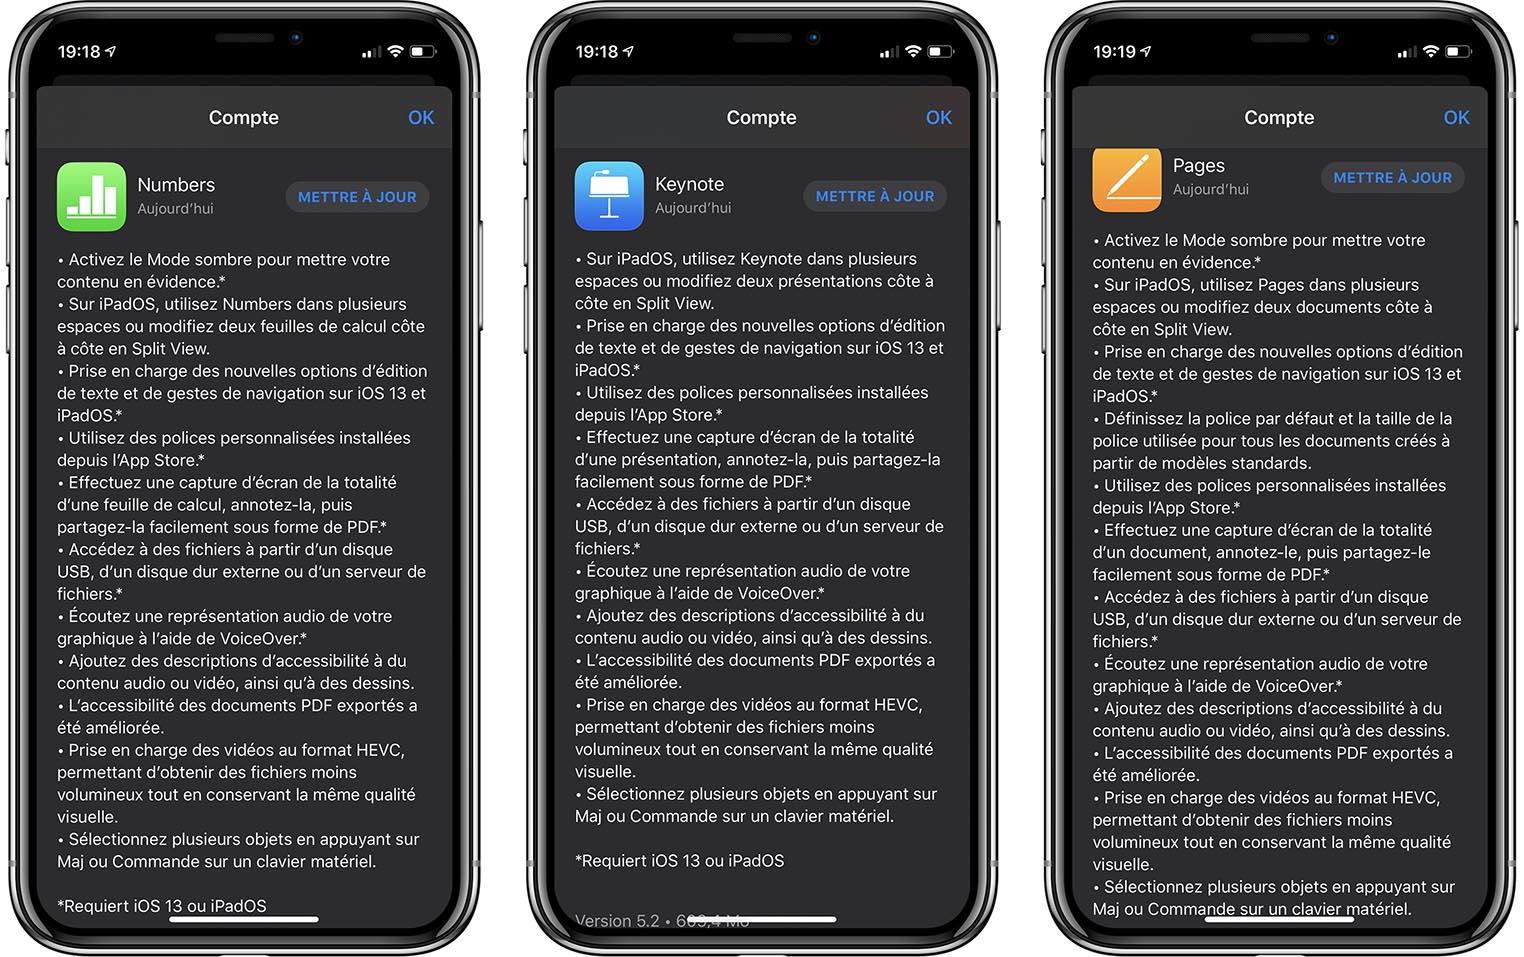 iWork iOS 13